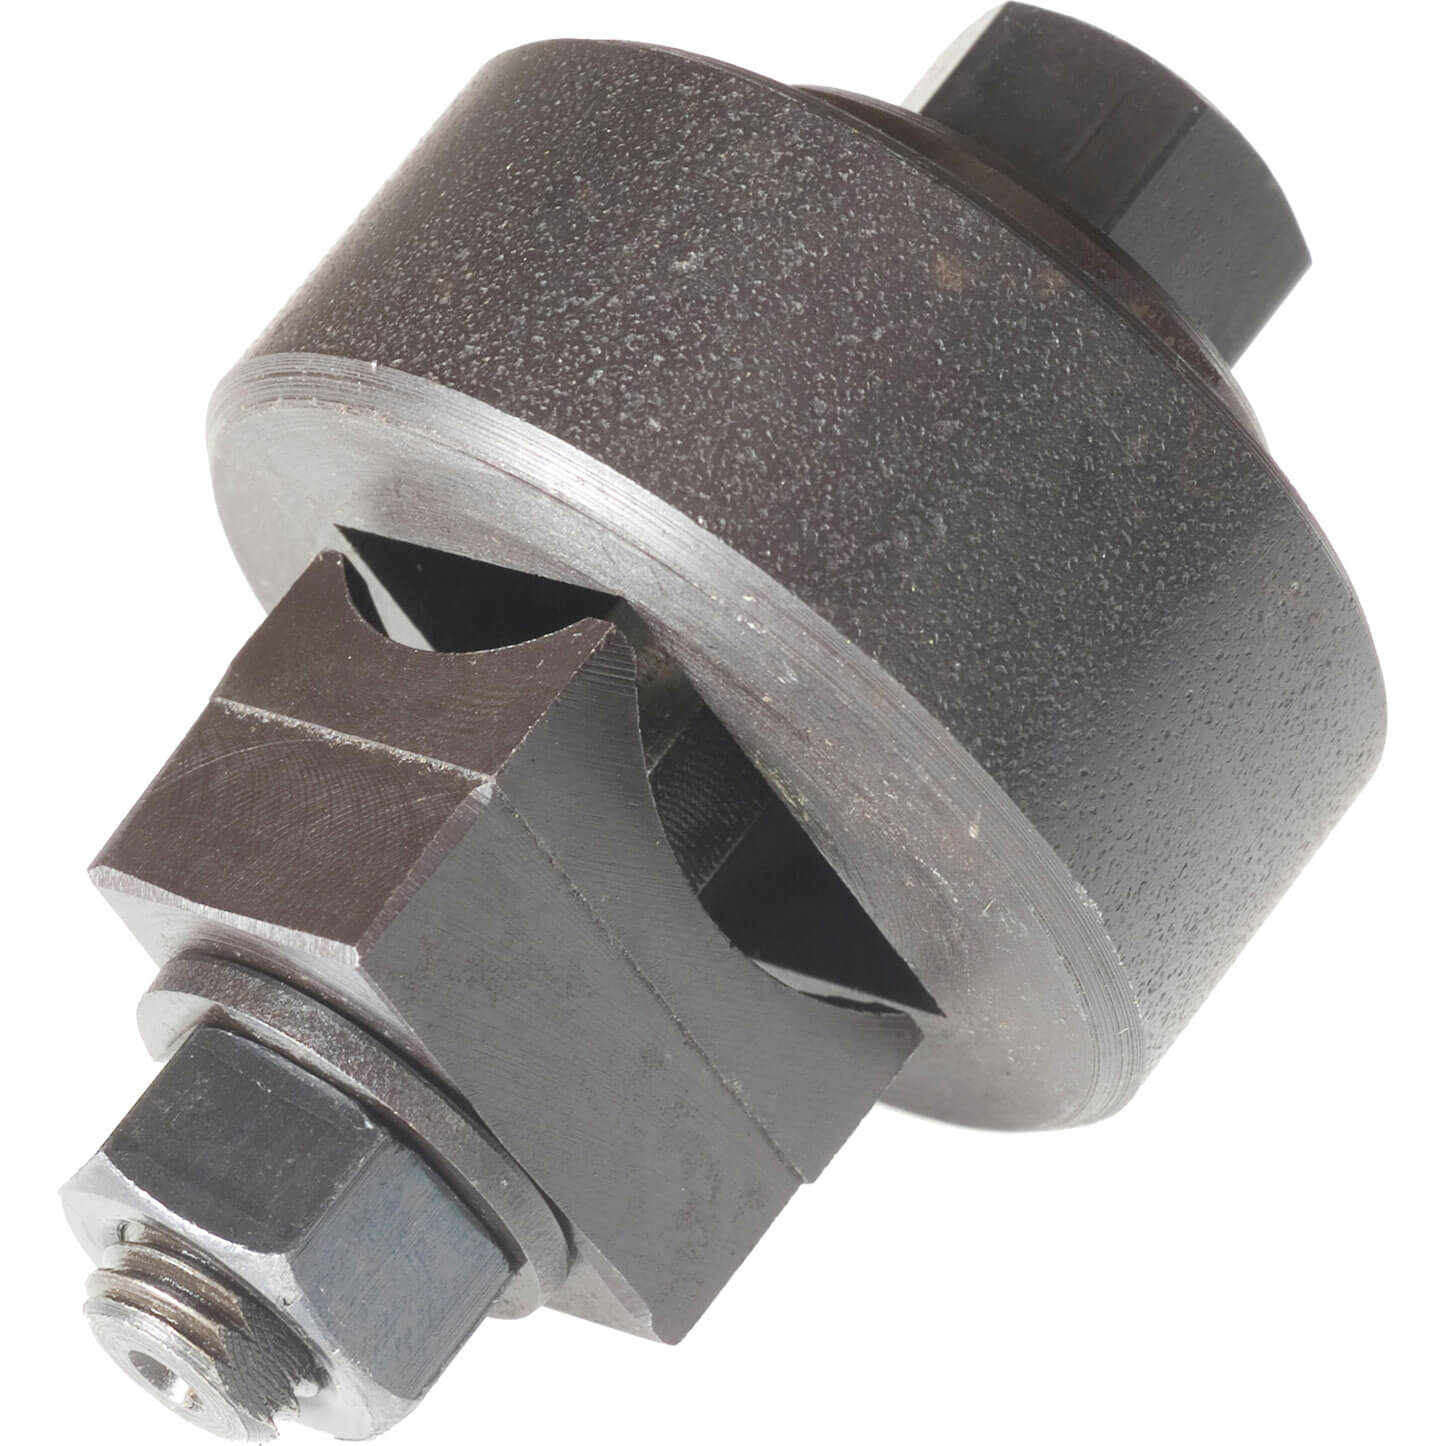 QMax Sheet Metal Square Hole Punch Metric 19mm